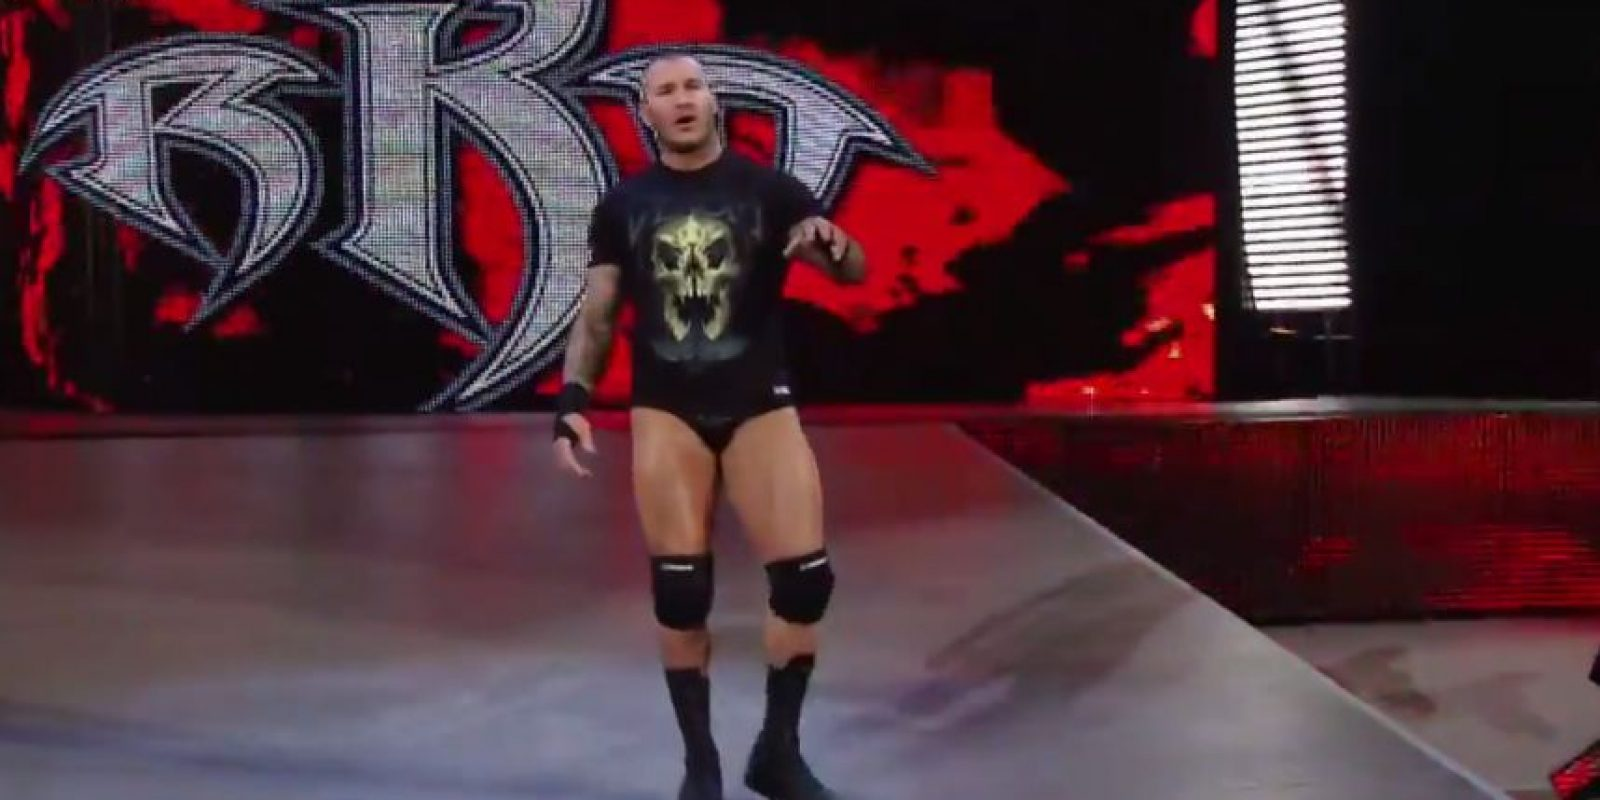 Cuando Seth iba a atacar a Jon, apareció Randy Orton Foto:WWE